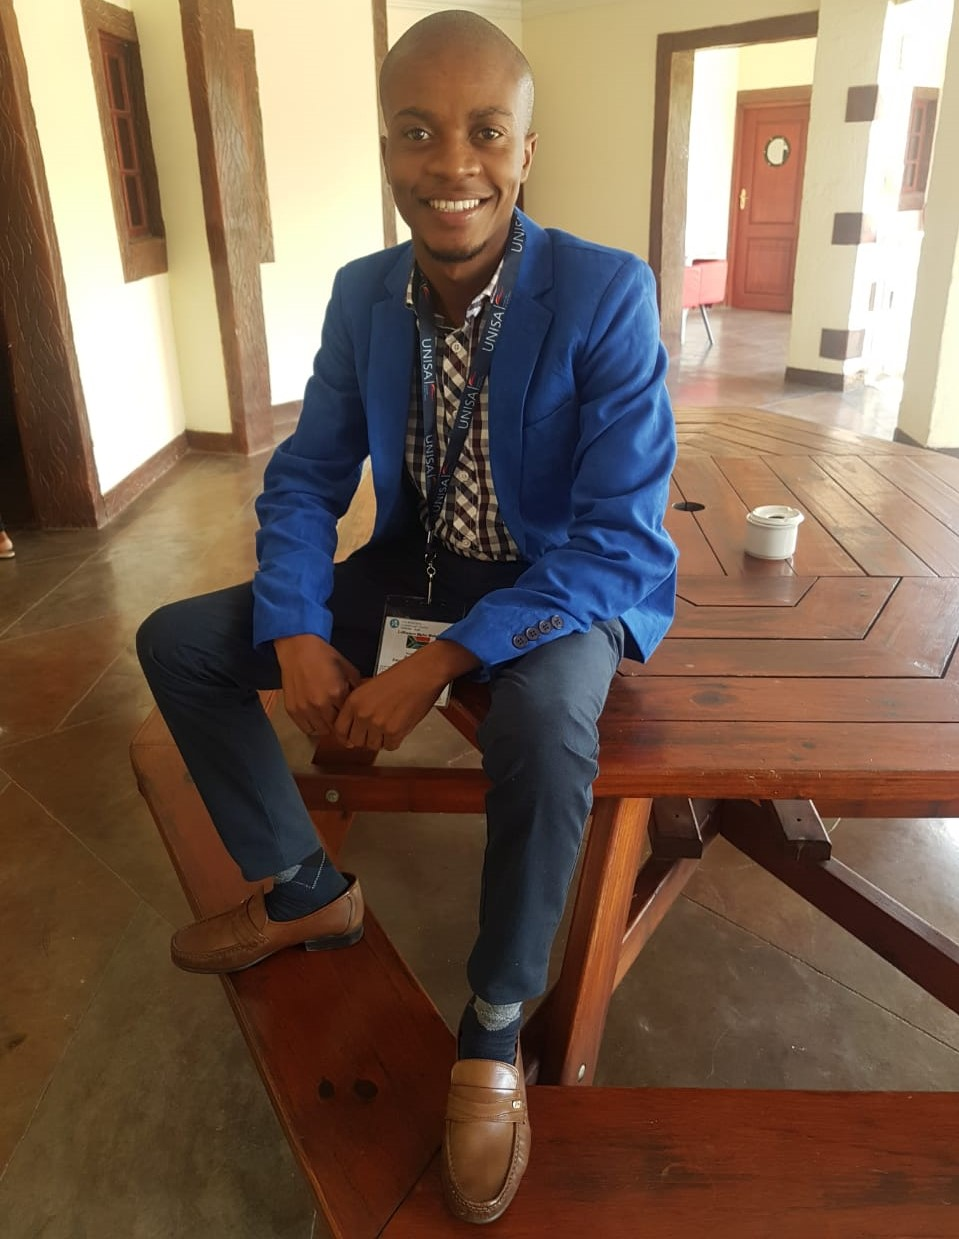 Mr Luthando Molefe is a postgraduate student (Teacher Development Studies) at UKZN's School of Education